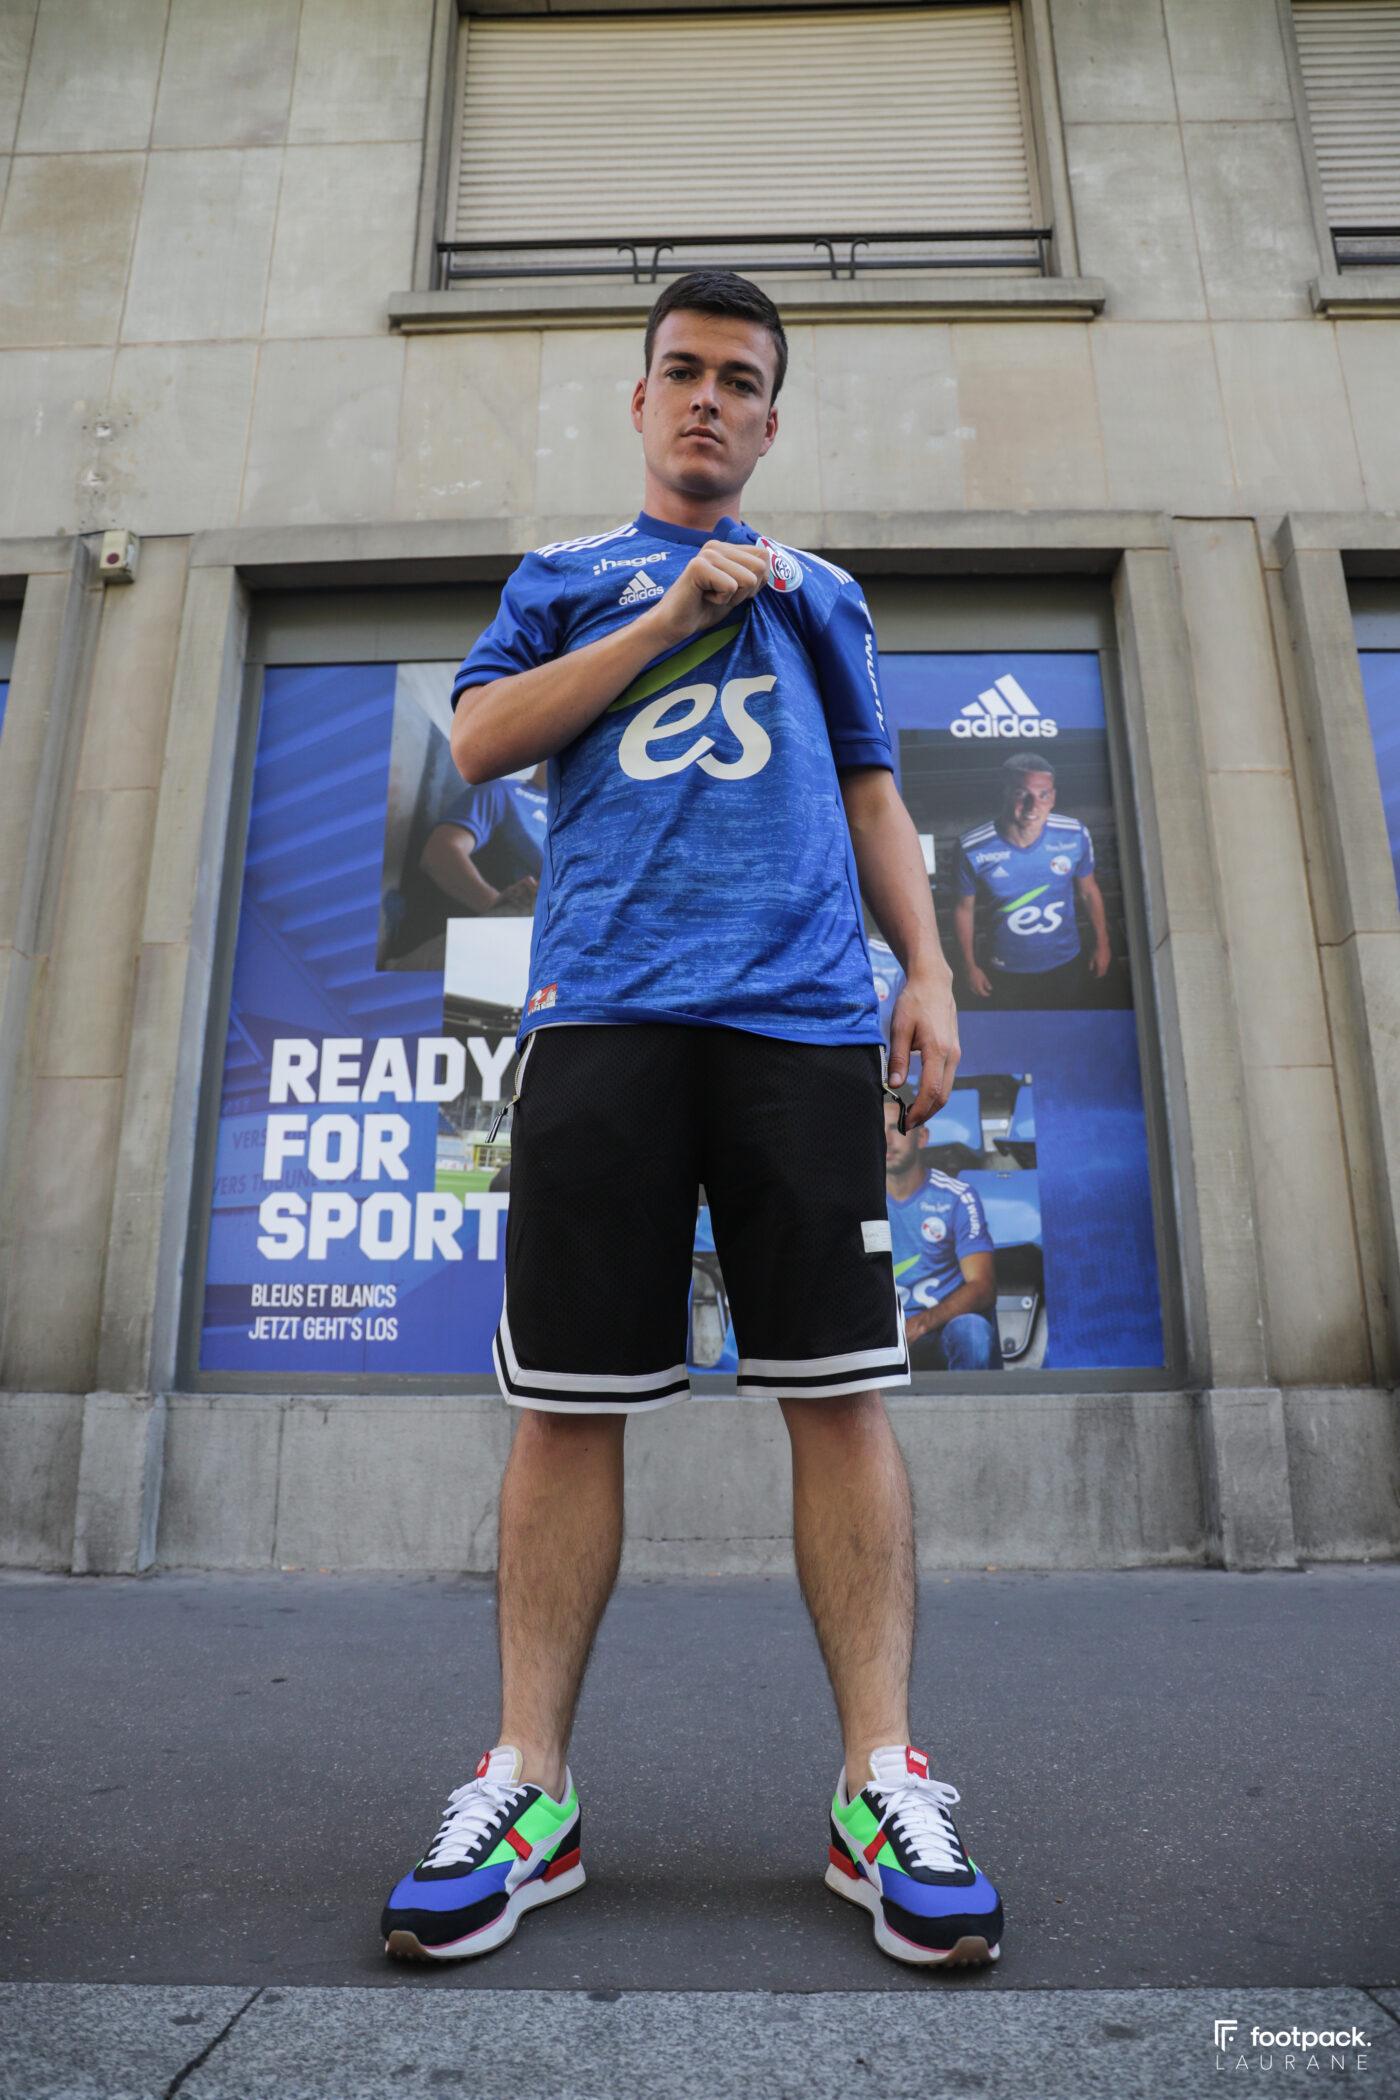 Maillot RC Strasbourg adidas